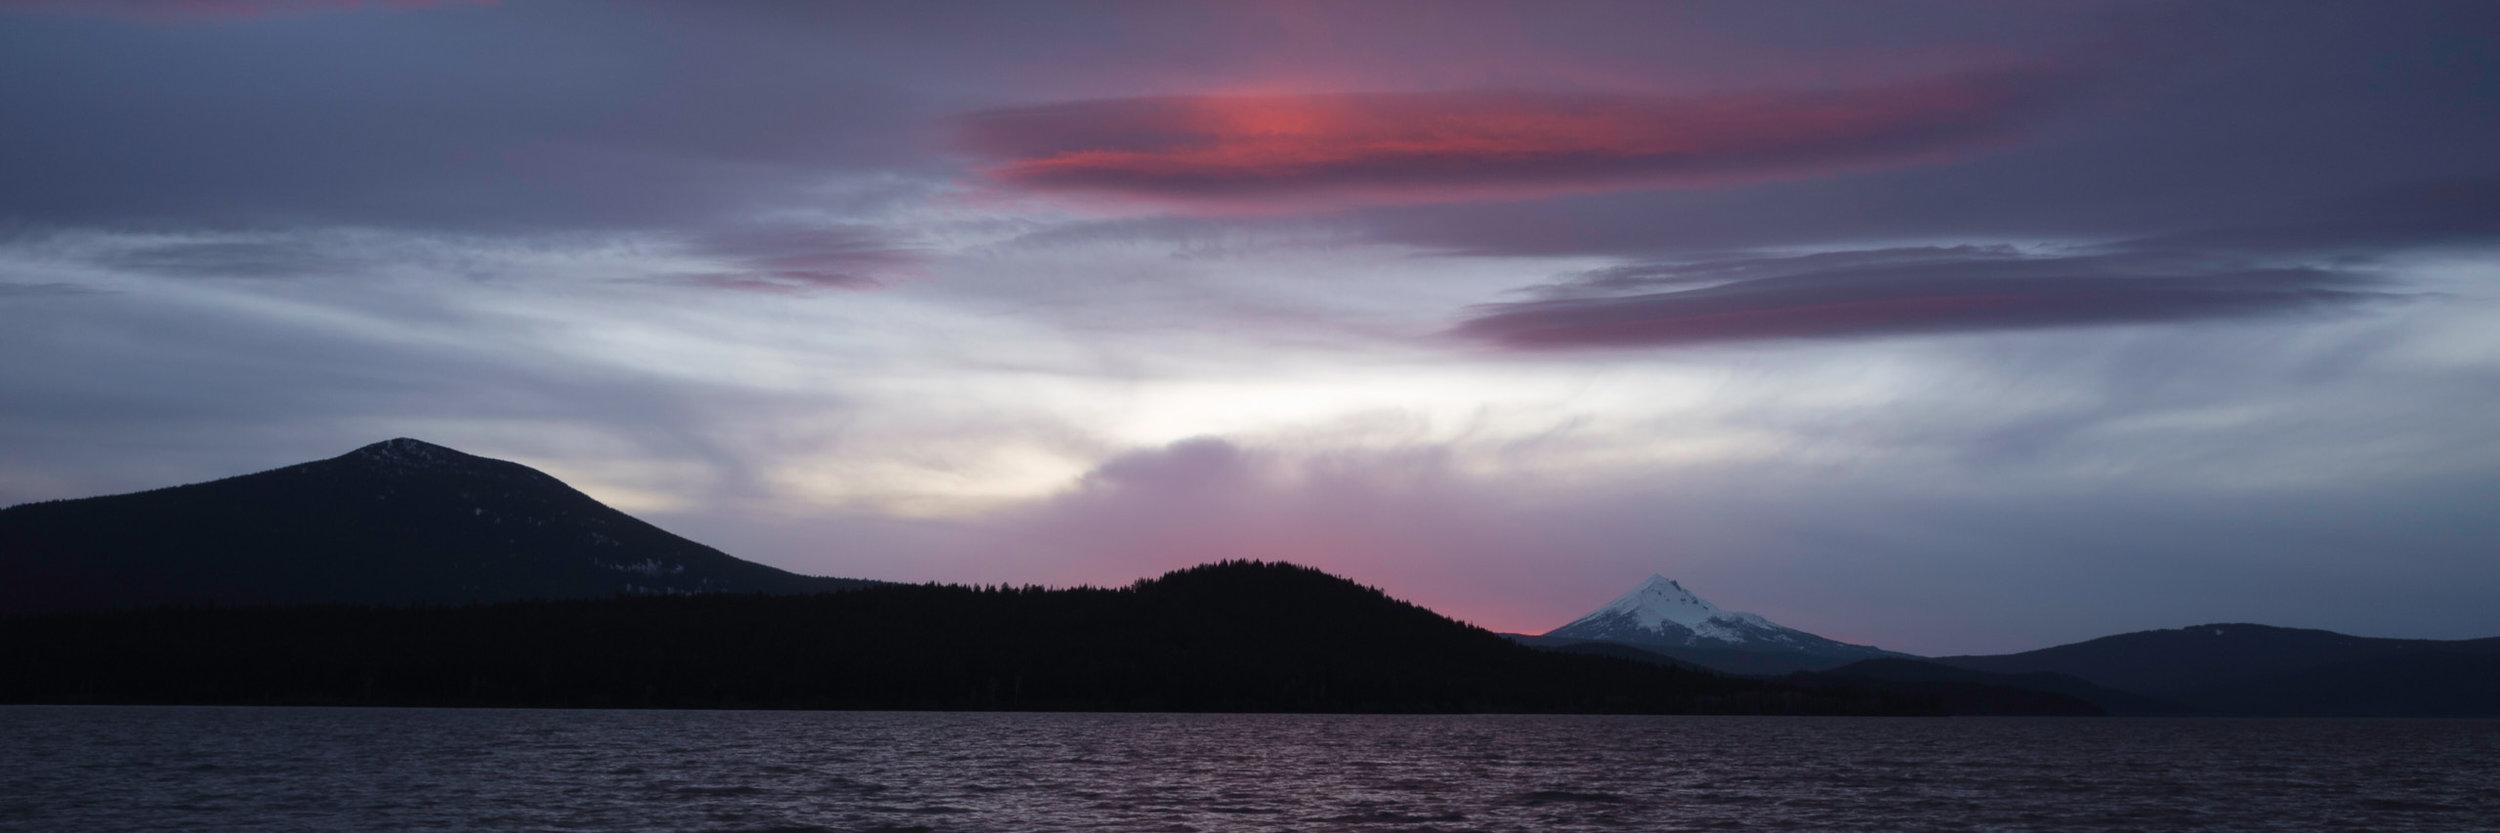 Klamath NWR Sunset_2014 - -89-20140313_Eagle_Ridge_Klamath_Falls_Oregon_0156.jpg